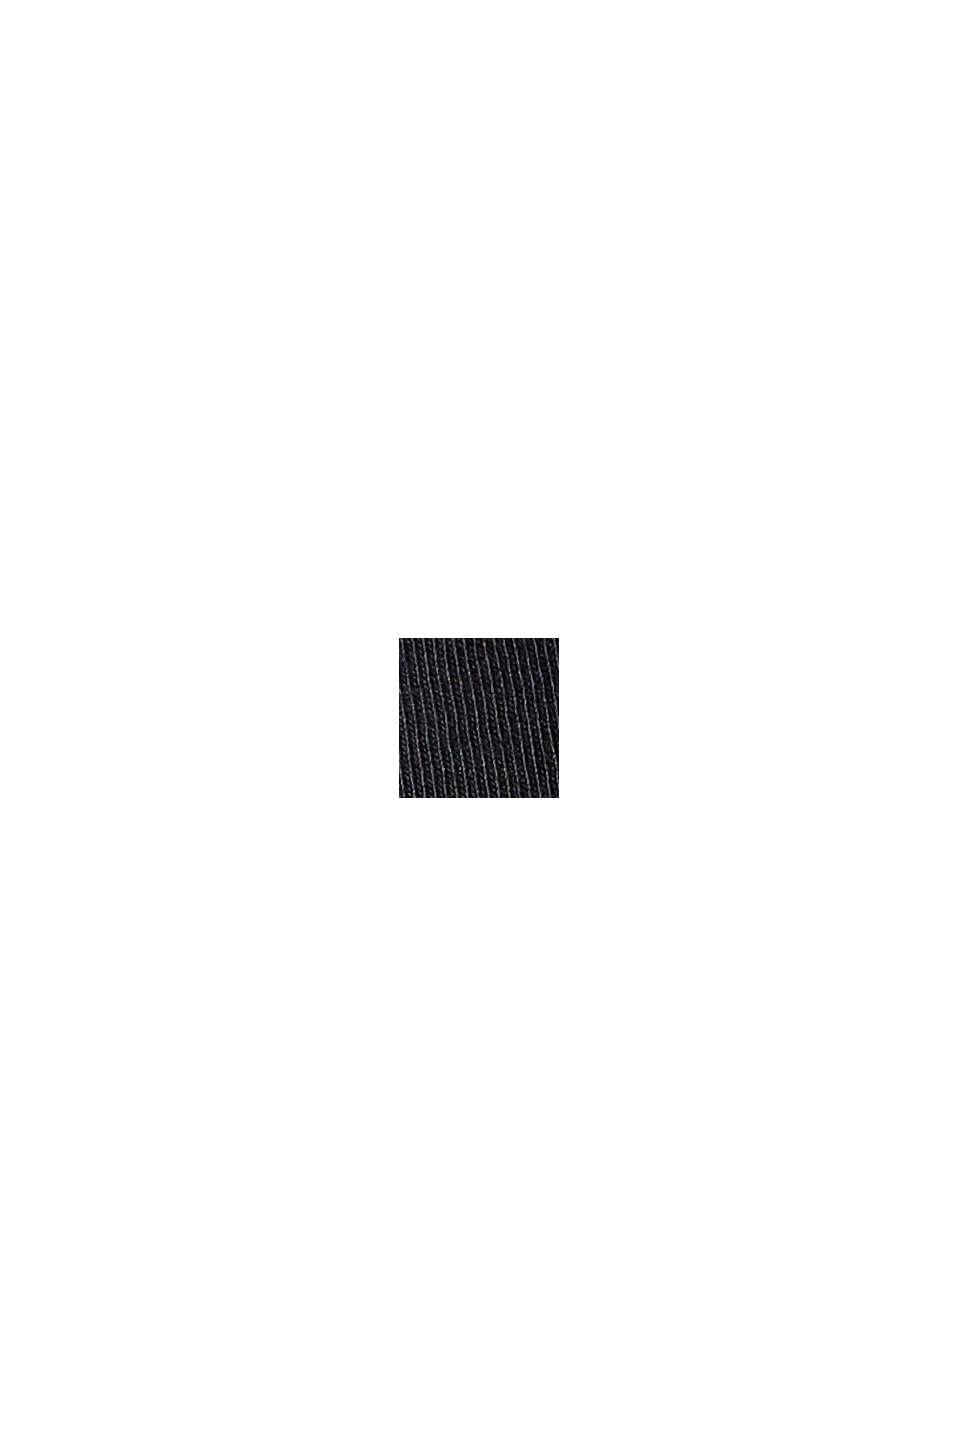 Camiseta larga de estilo oversize en 100% algodón ecológico, BLACK, swatch